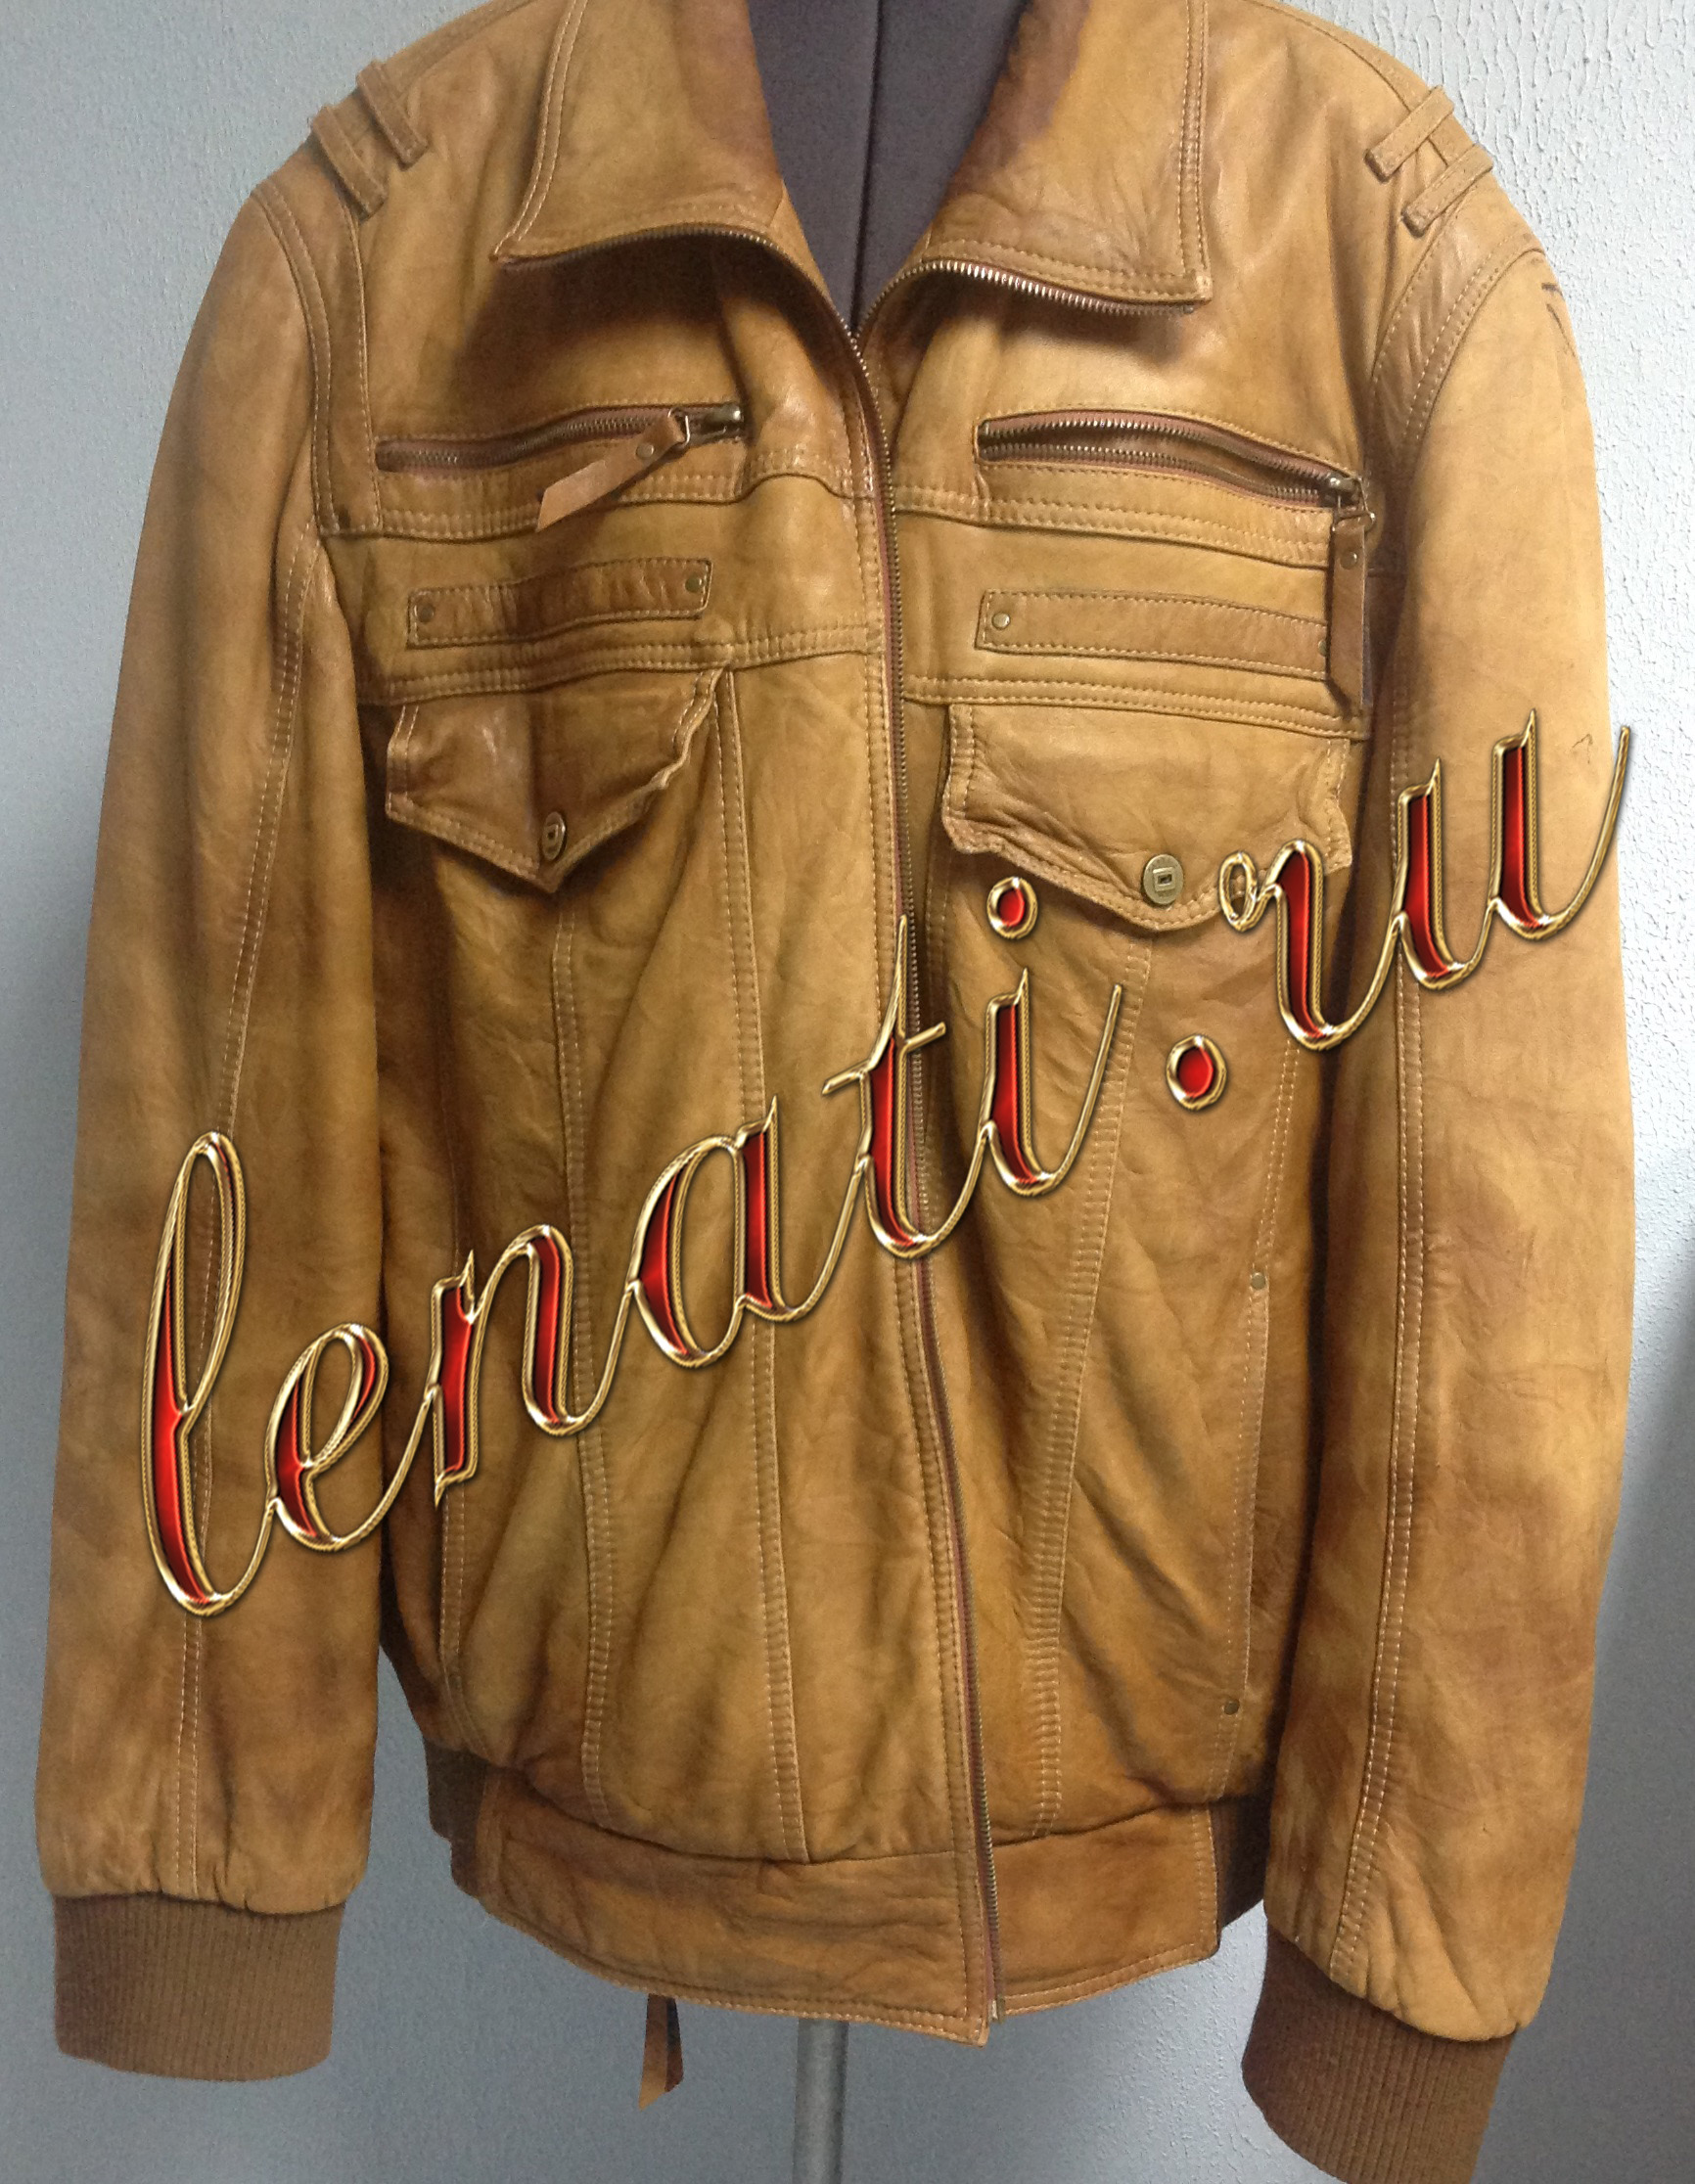 покраска кожаных курток фото до после краснодар